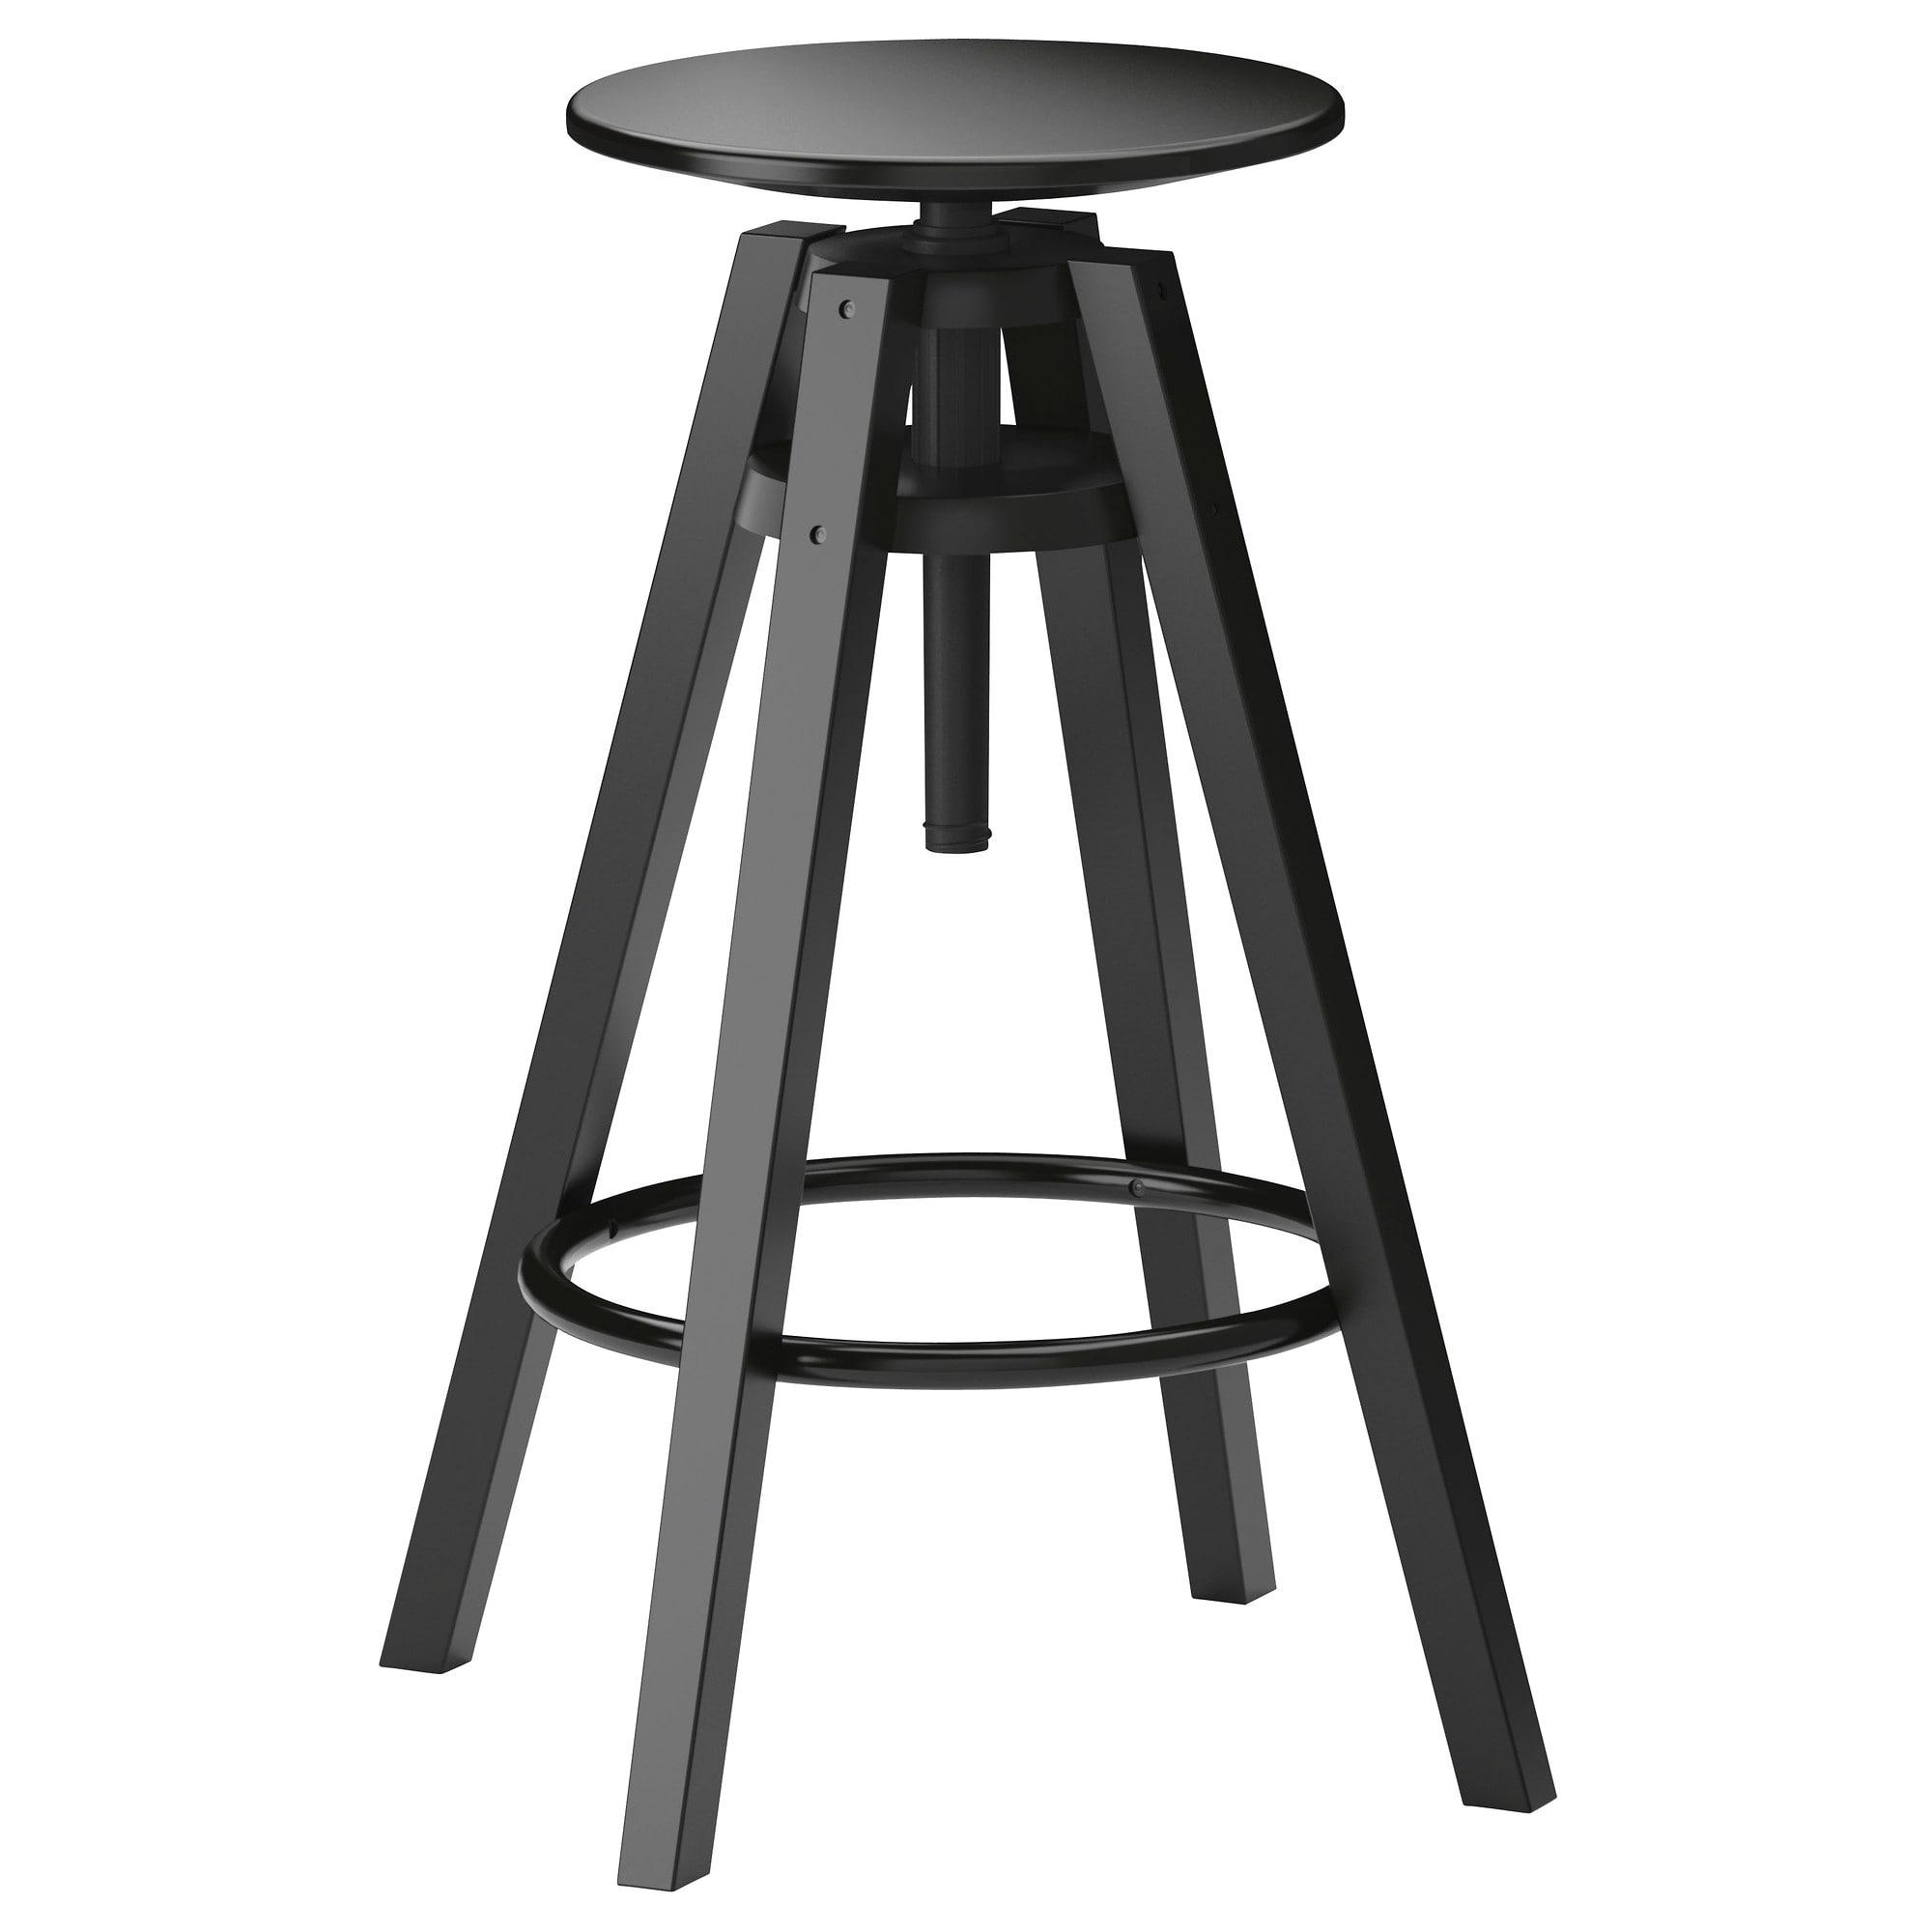 Awesome Ikea Dalfred Bar Stool Black Furniture Furniture Ideas Bralicious Painted Fabric Chair Ideas Braliciousco